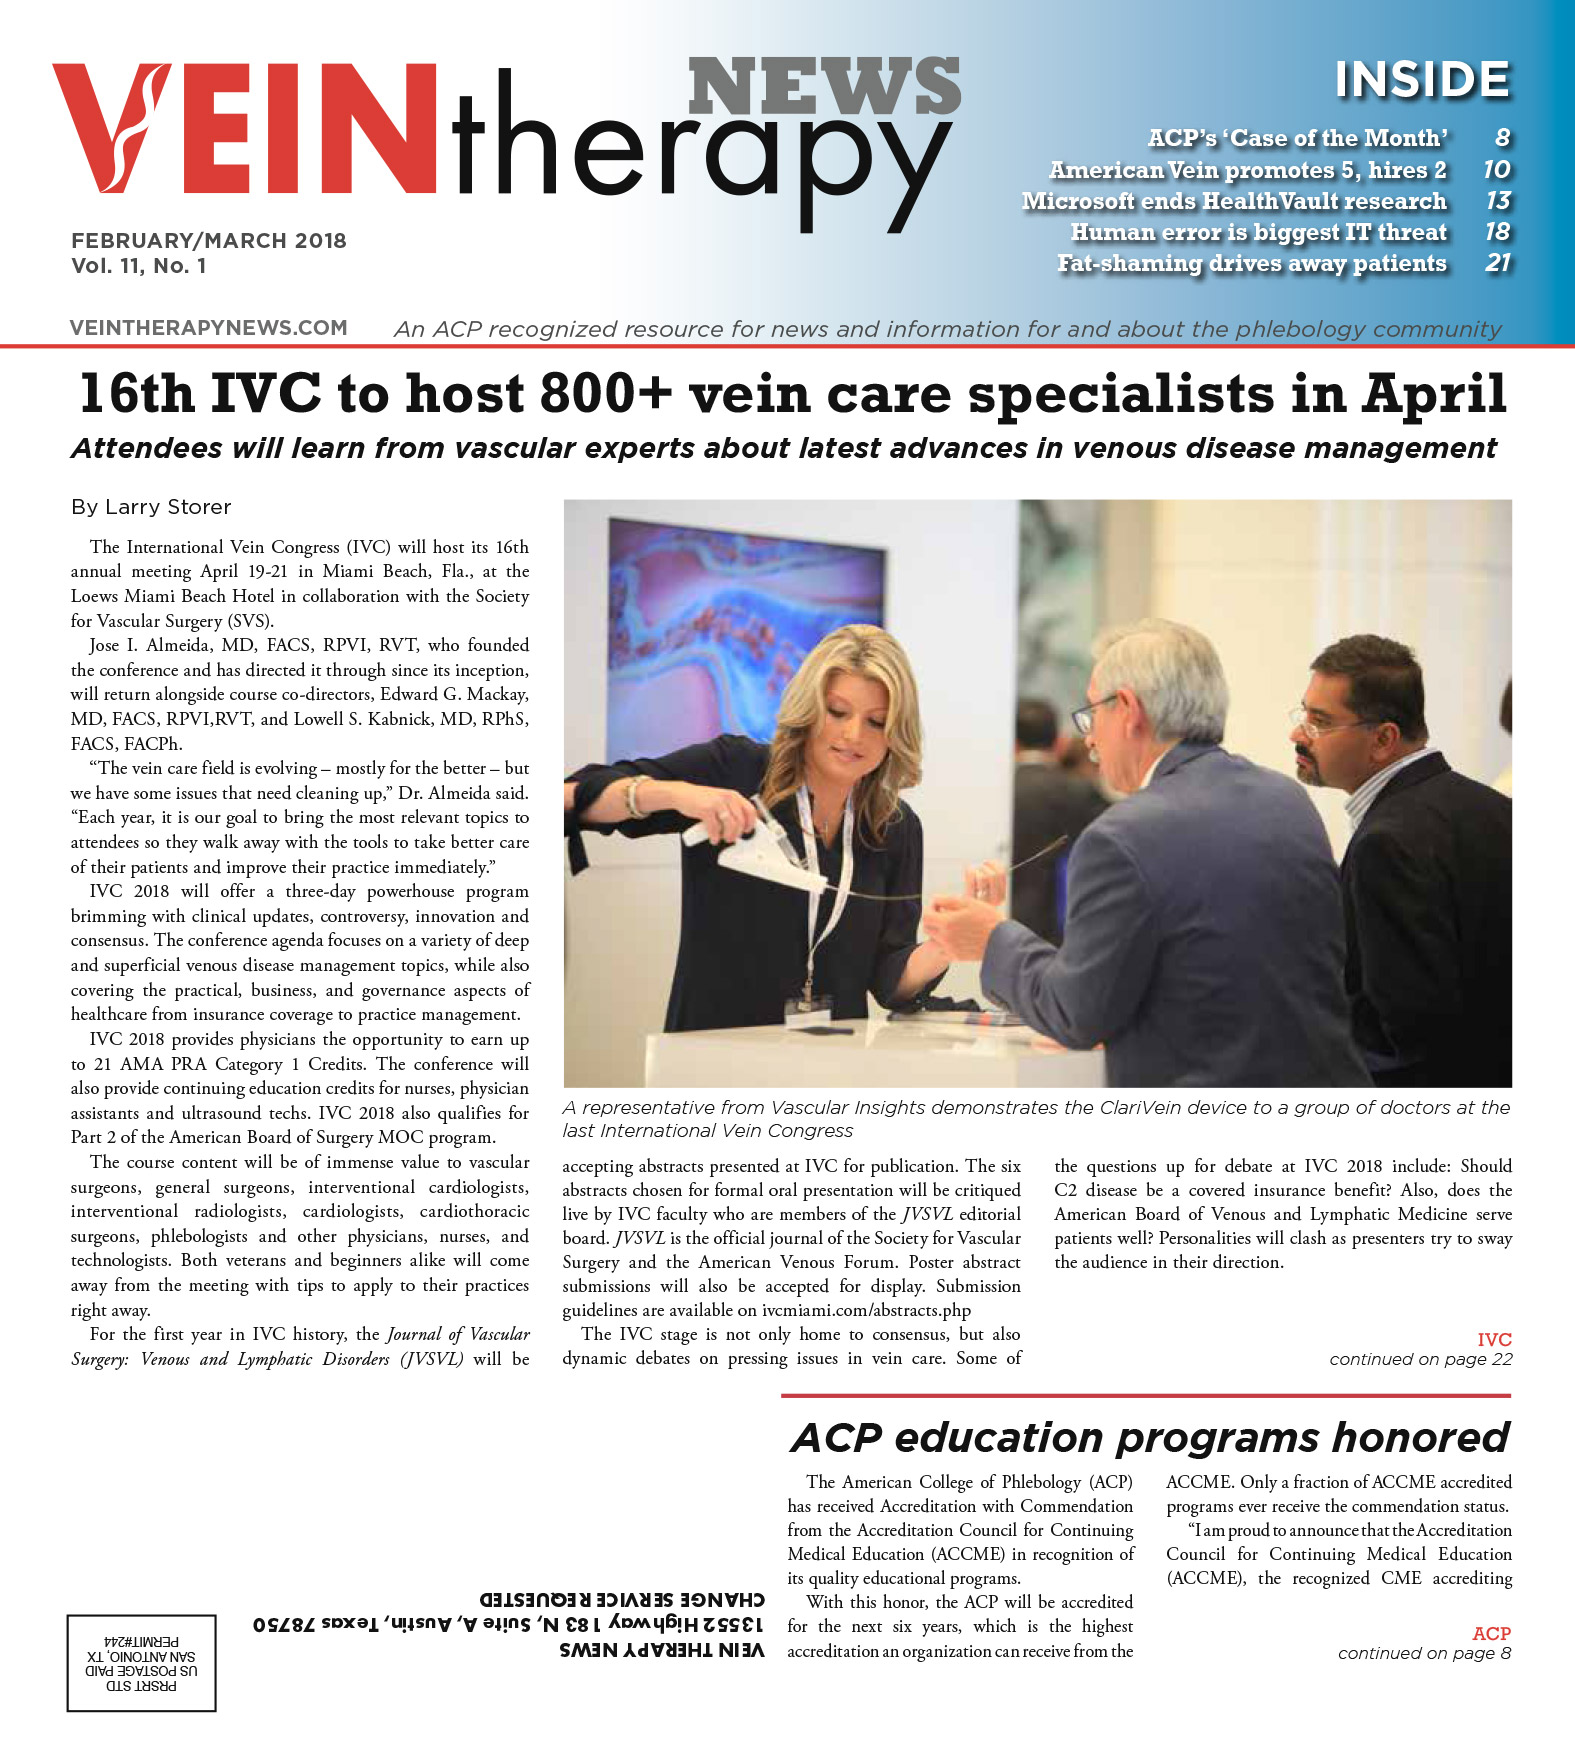 VTN 0203-18 cover